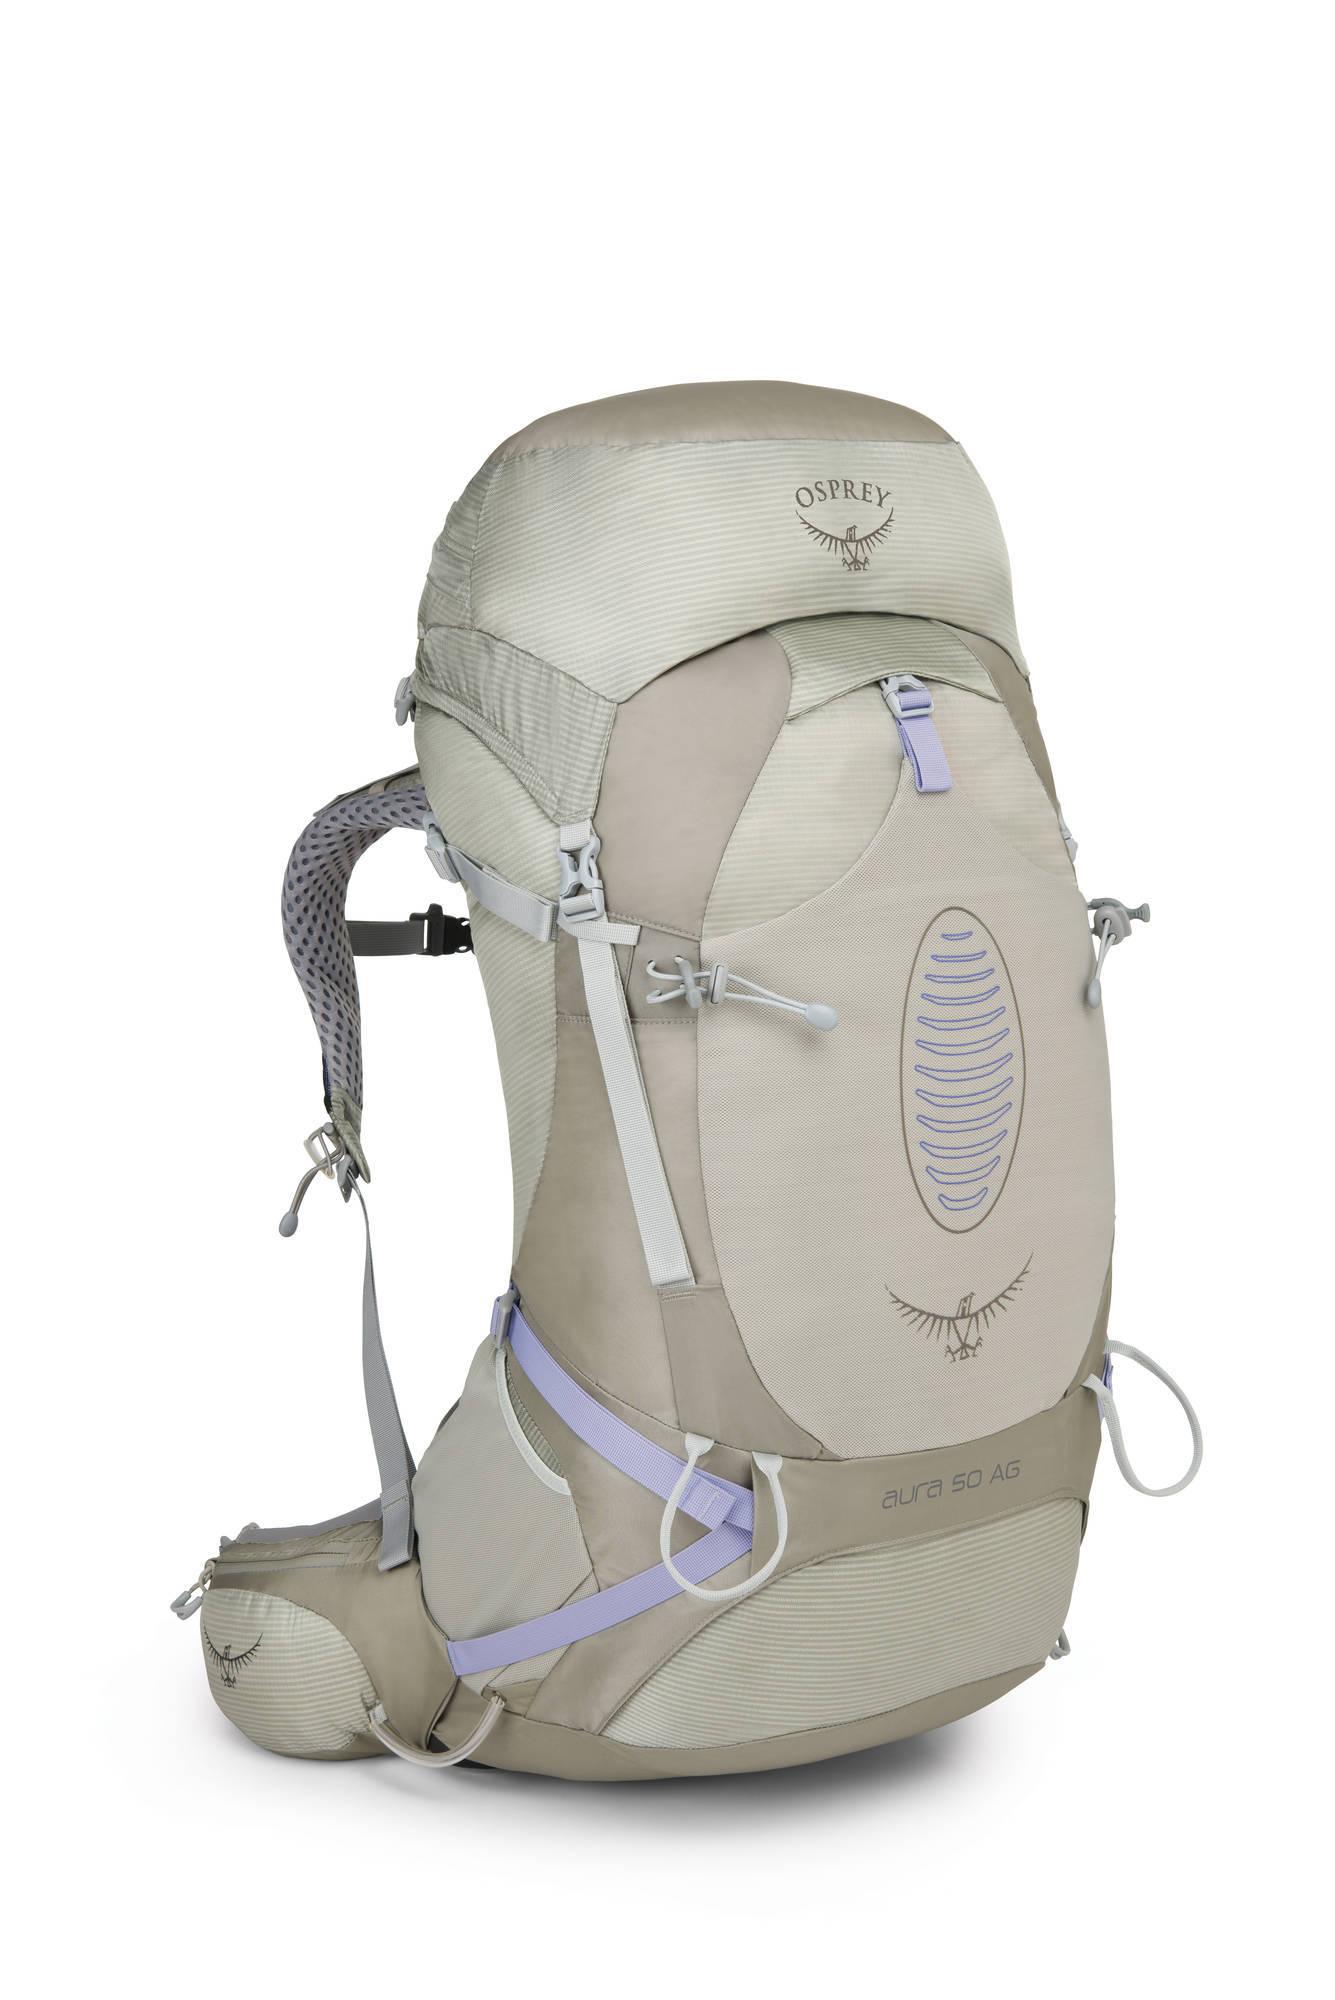 Туристические рюкзаки Рюкзак туристический женский Osprey Aura AG 50 Aura_AG_50_Side_Sliver_Streak_web.jpg